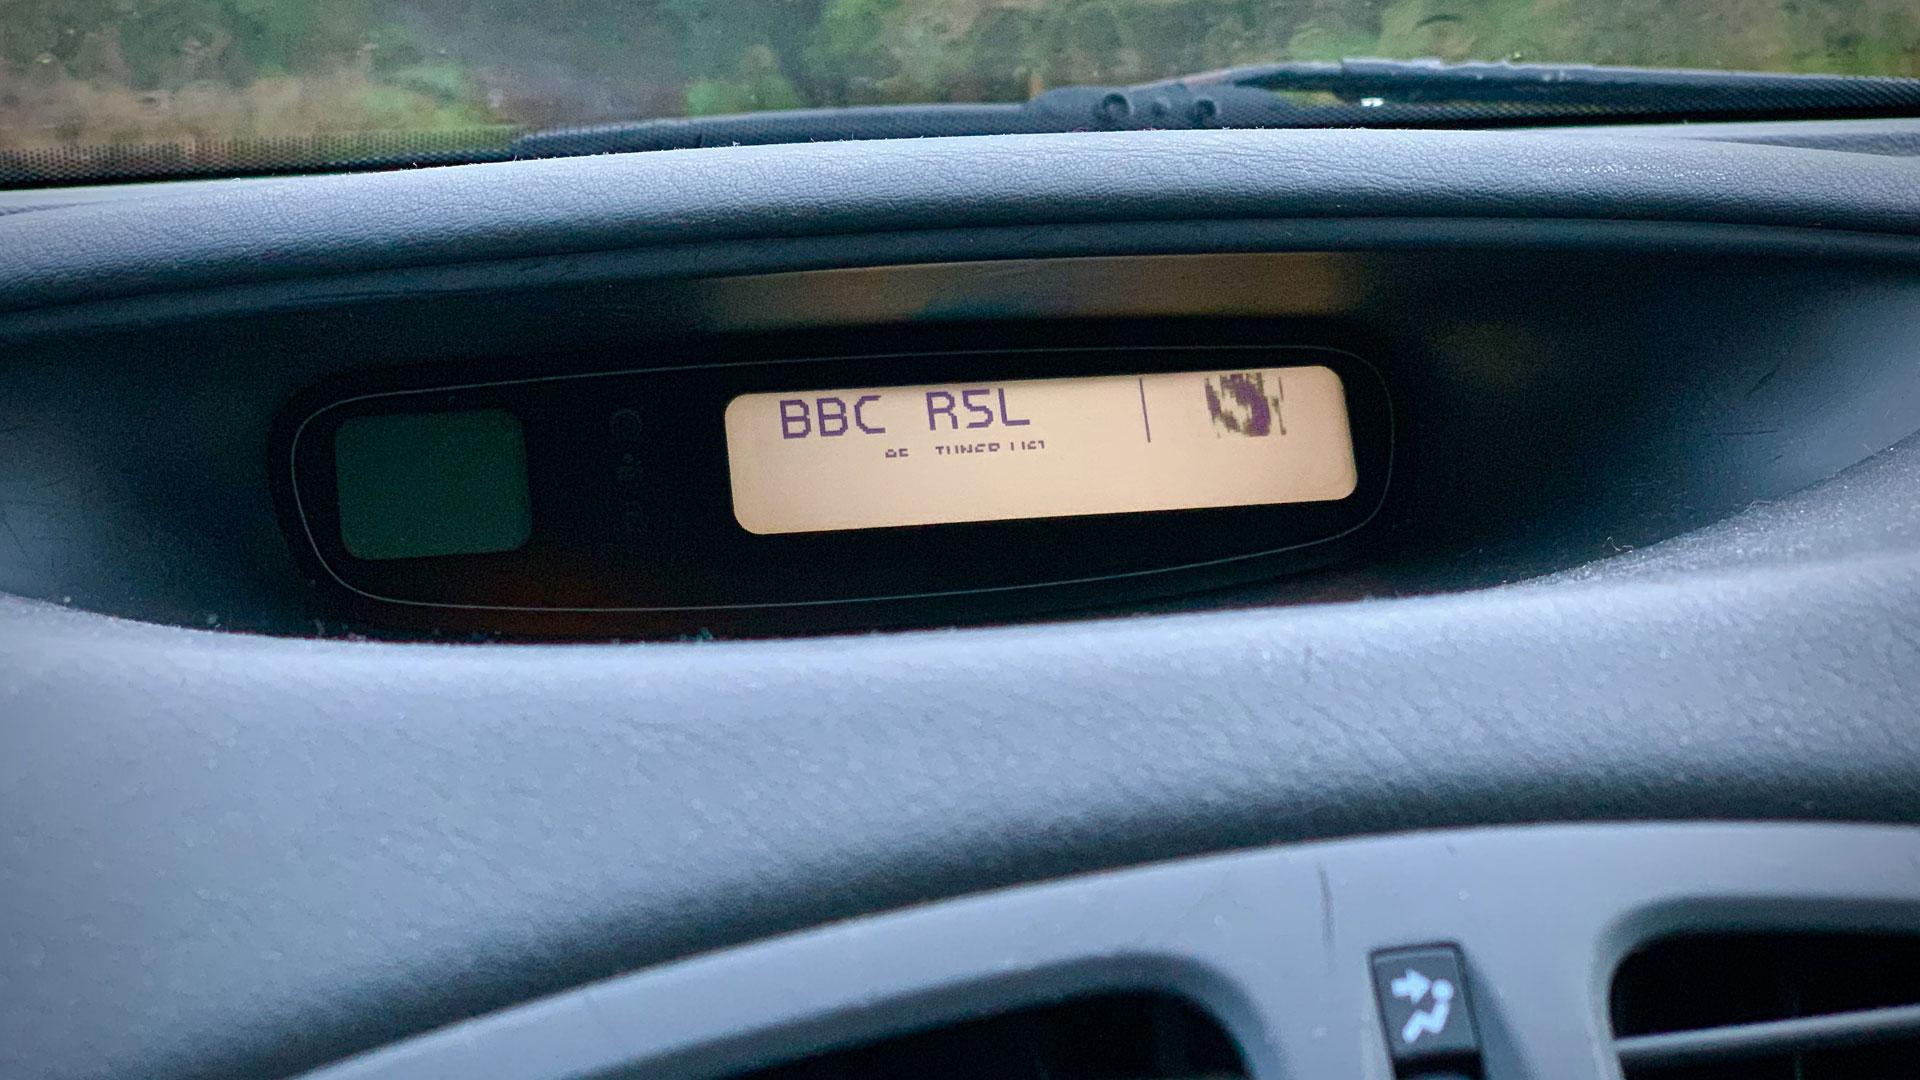 Pure Highway 400 BBC R5L